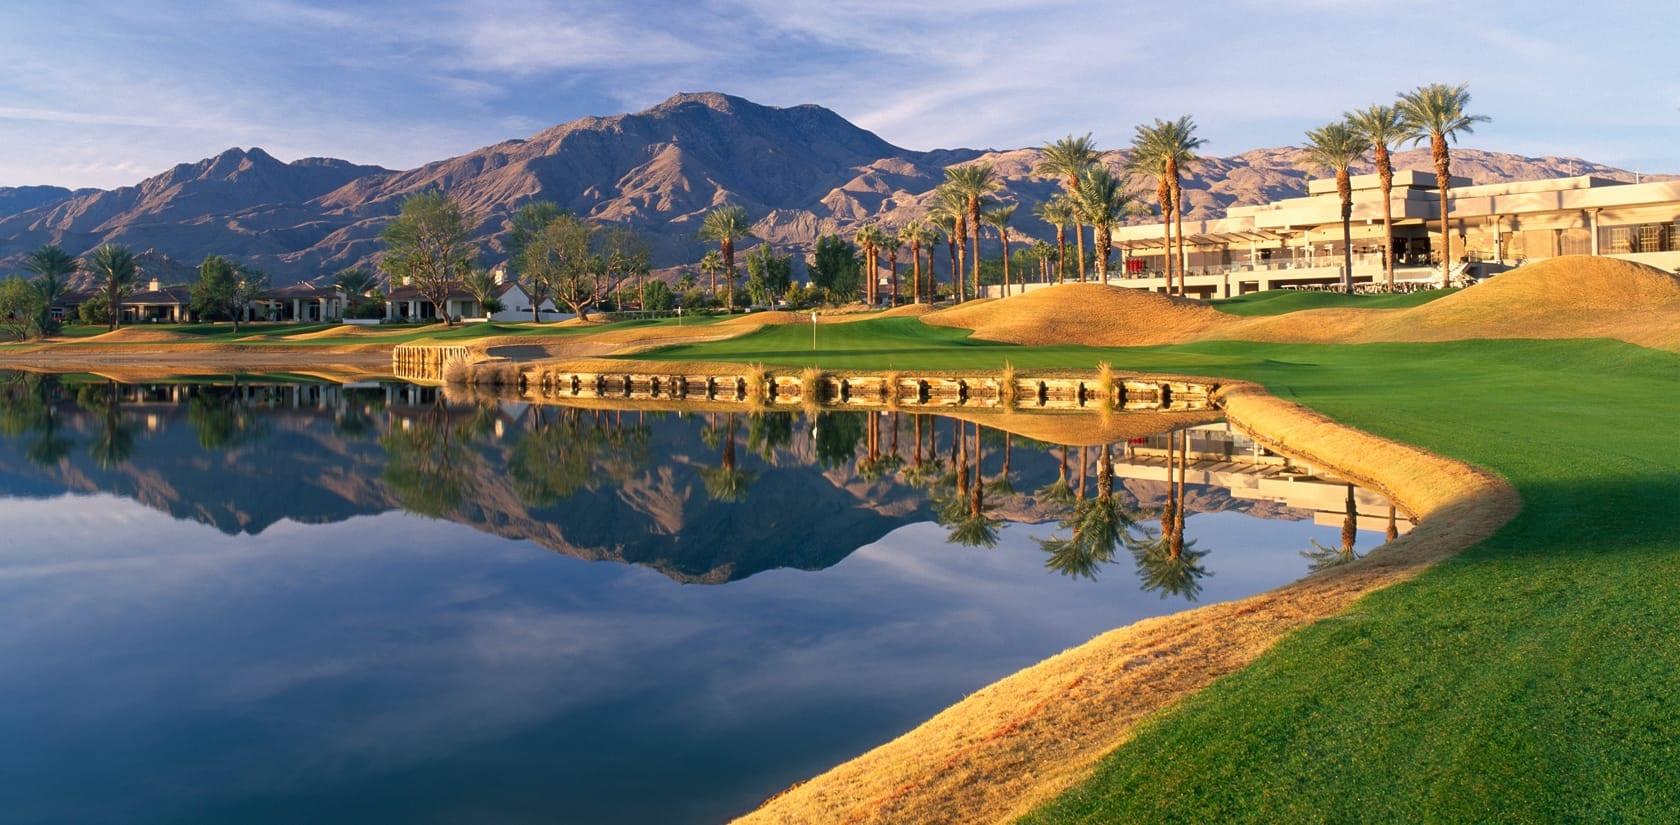 Golf at La Quinta Resort amp Club PGA WEST : pgagolfacademy from www.laquintaresort.com size 1680 x 825 jpeg 209kB